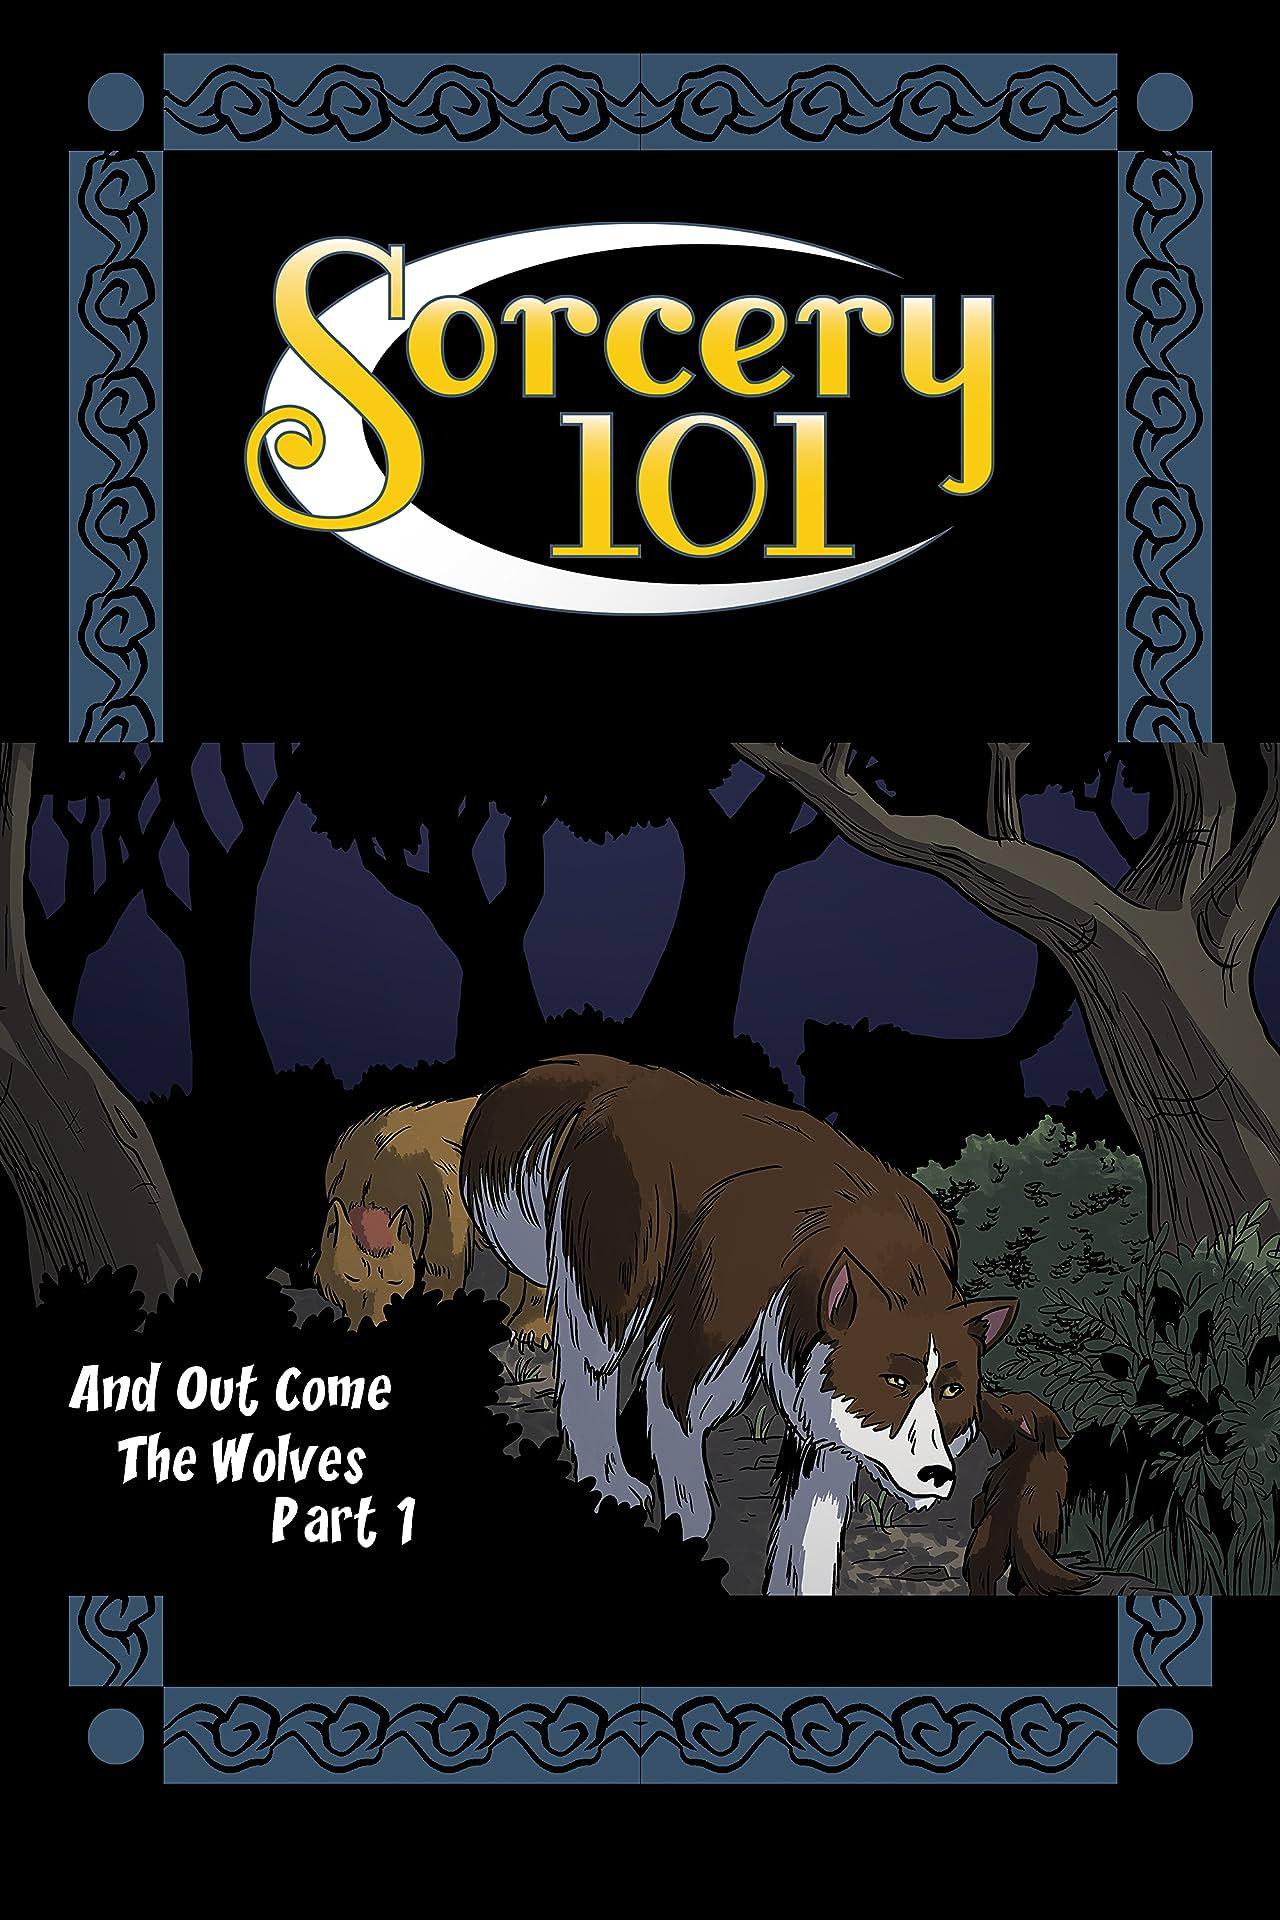 Sorcery 101 #14